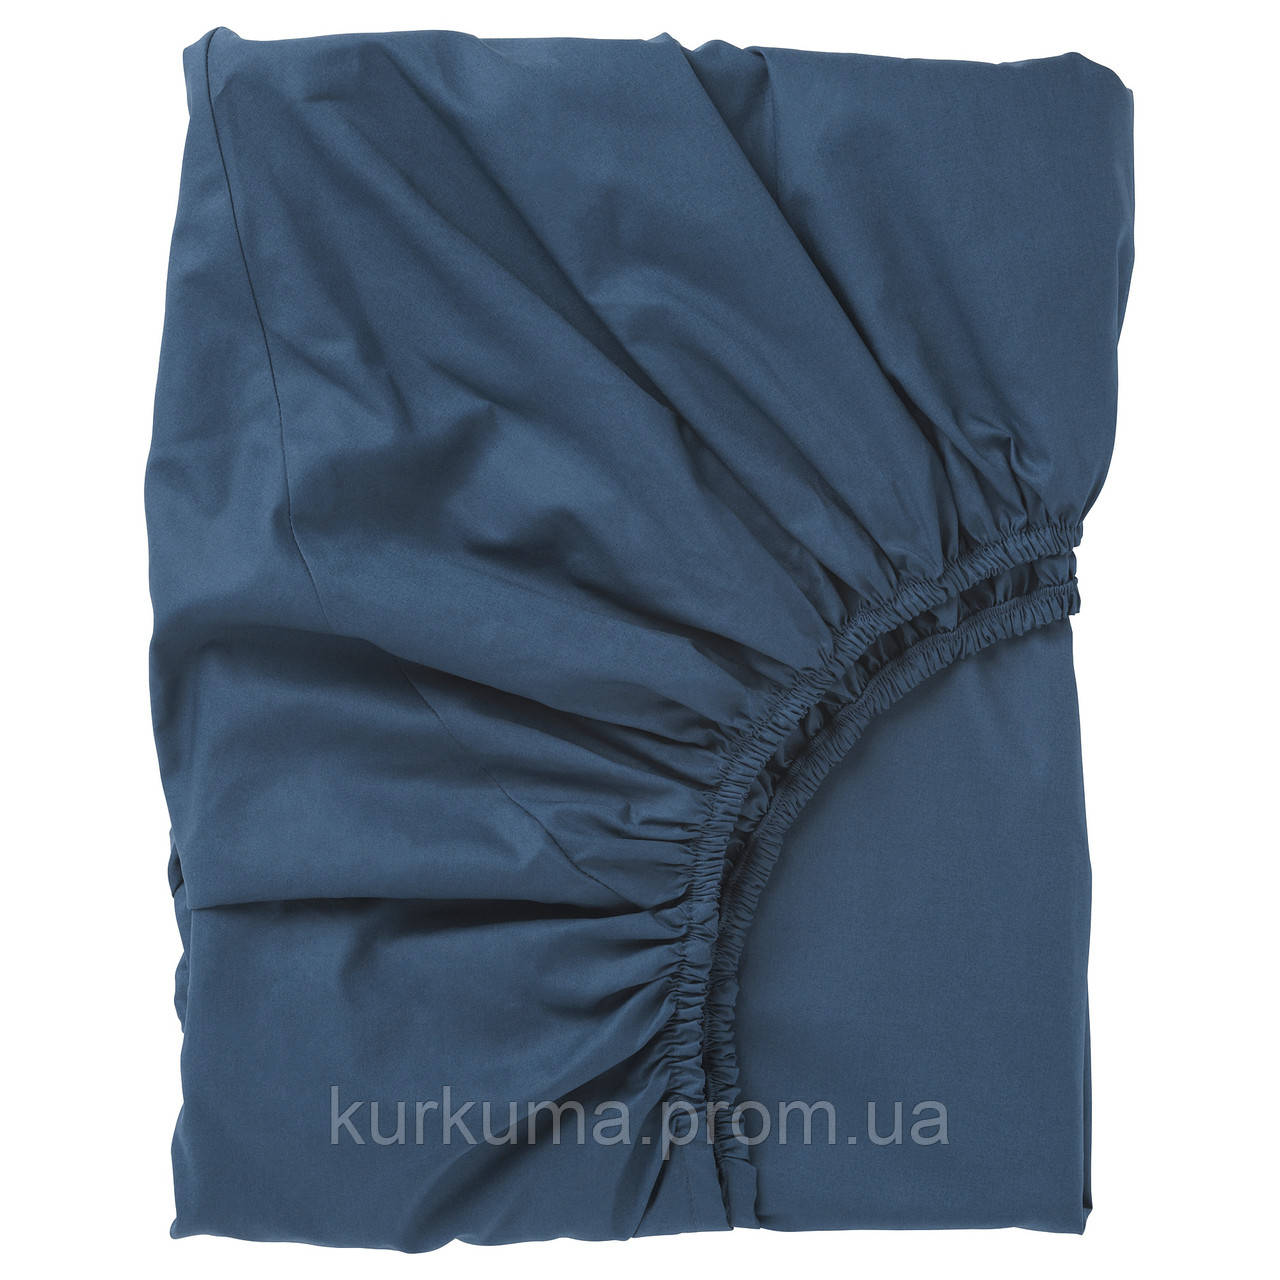 IKEA ULLVIDE Простыня, темно-синий  (703.427.26)